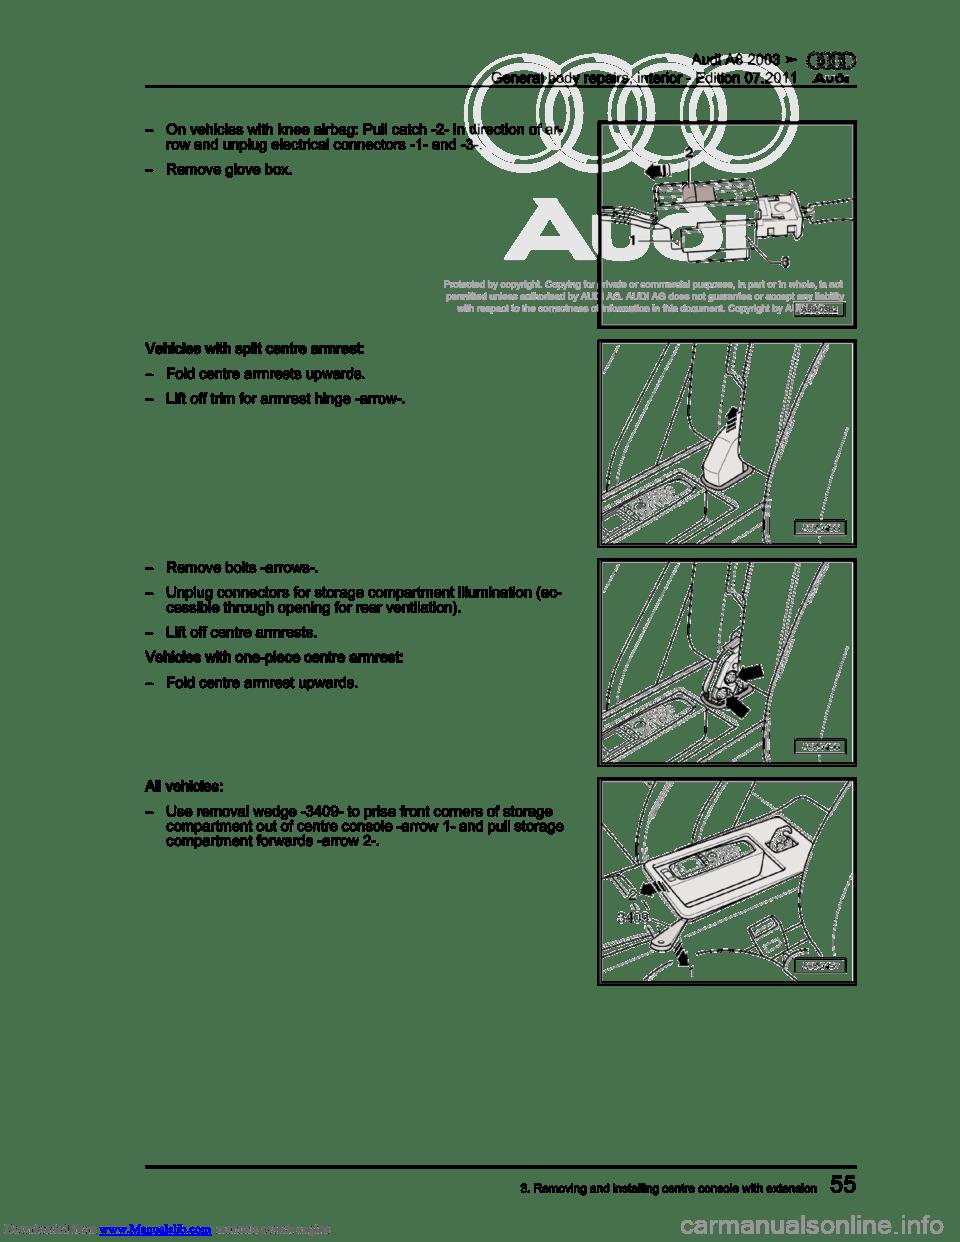 AUDI A8 2003 D3 / 2.G General System Repair Manual (401 Pages)